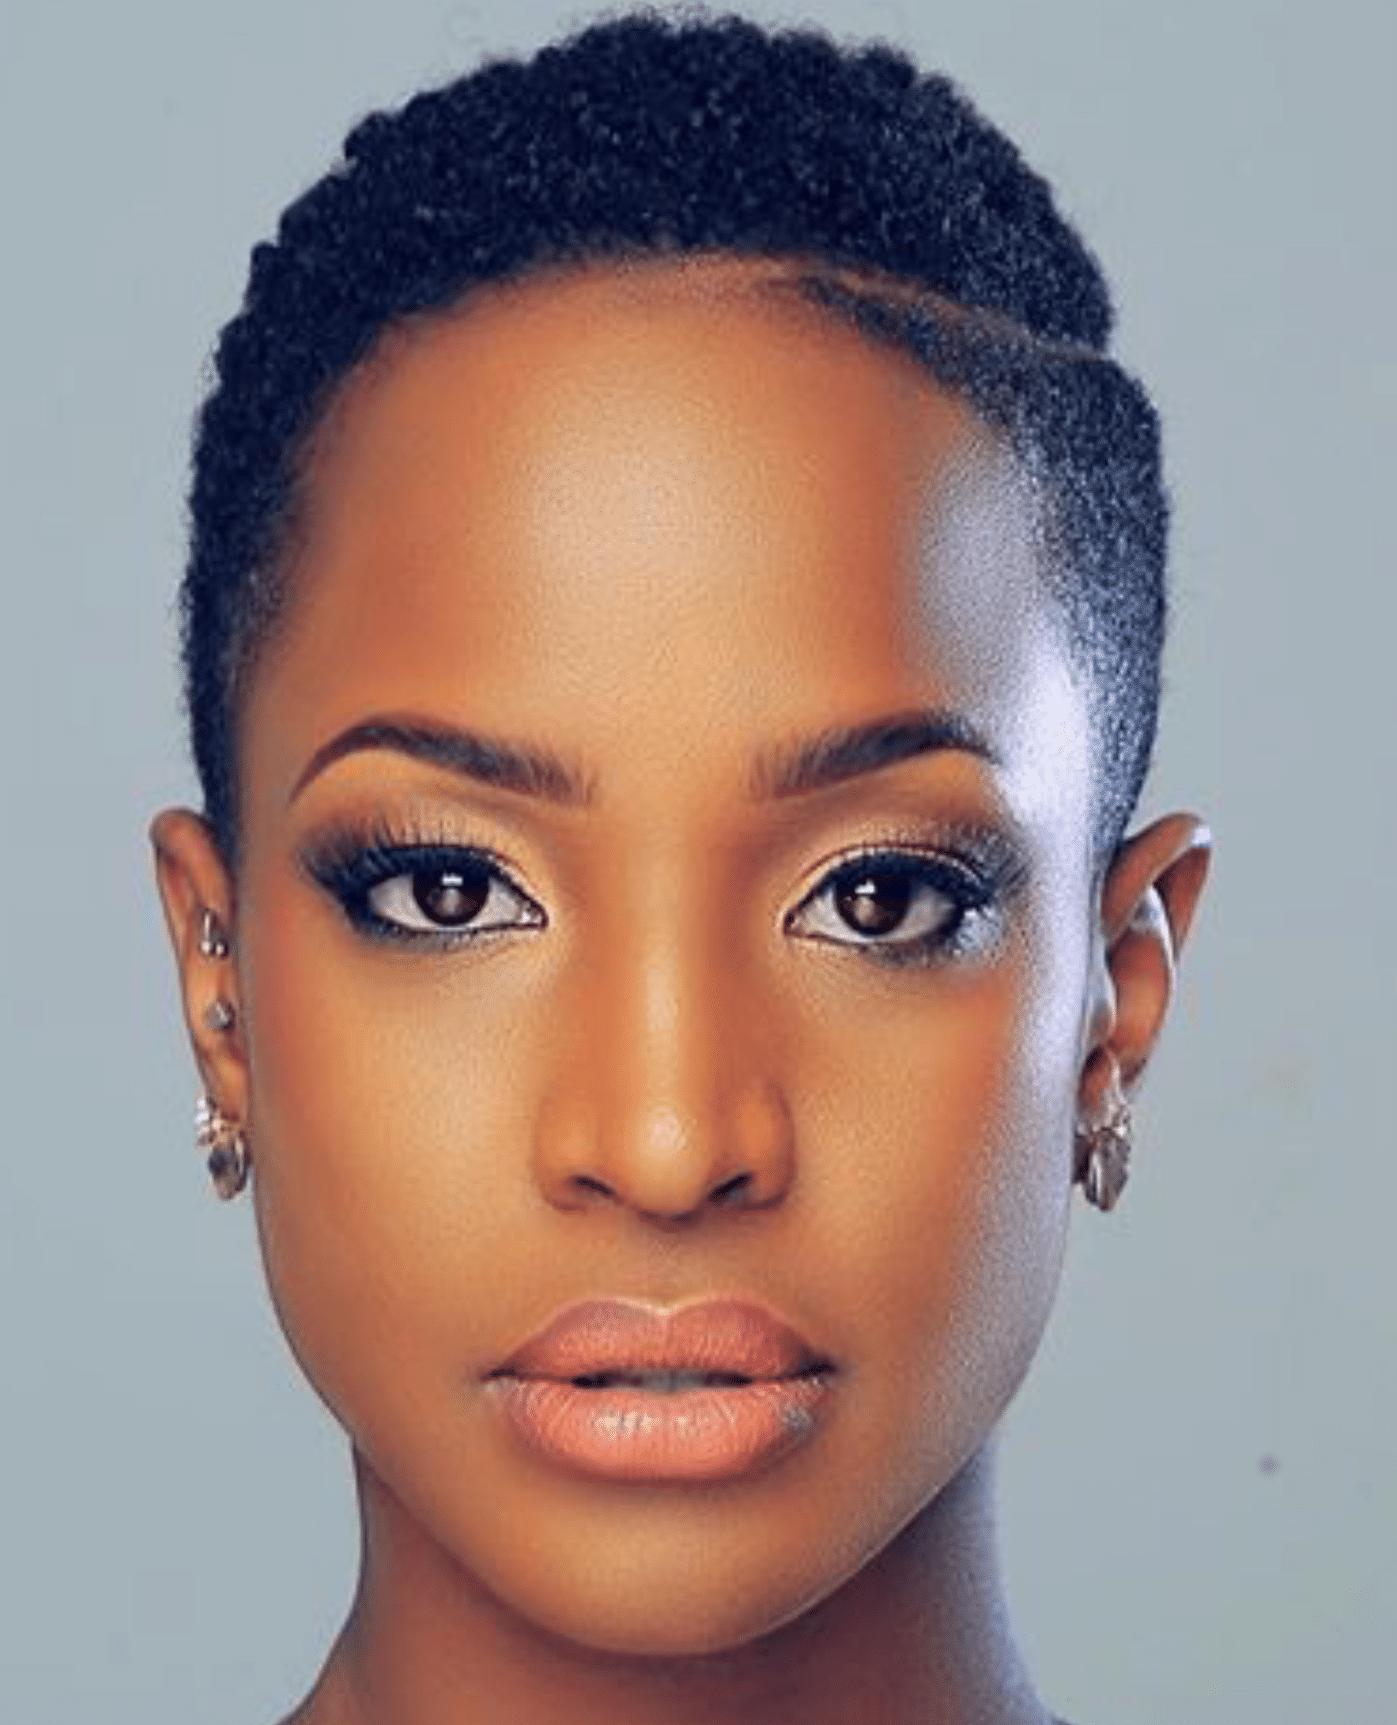 African ladies haircuts